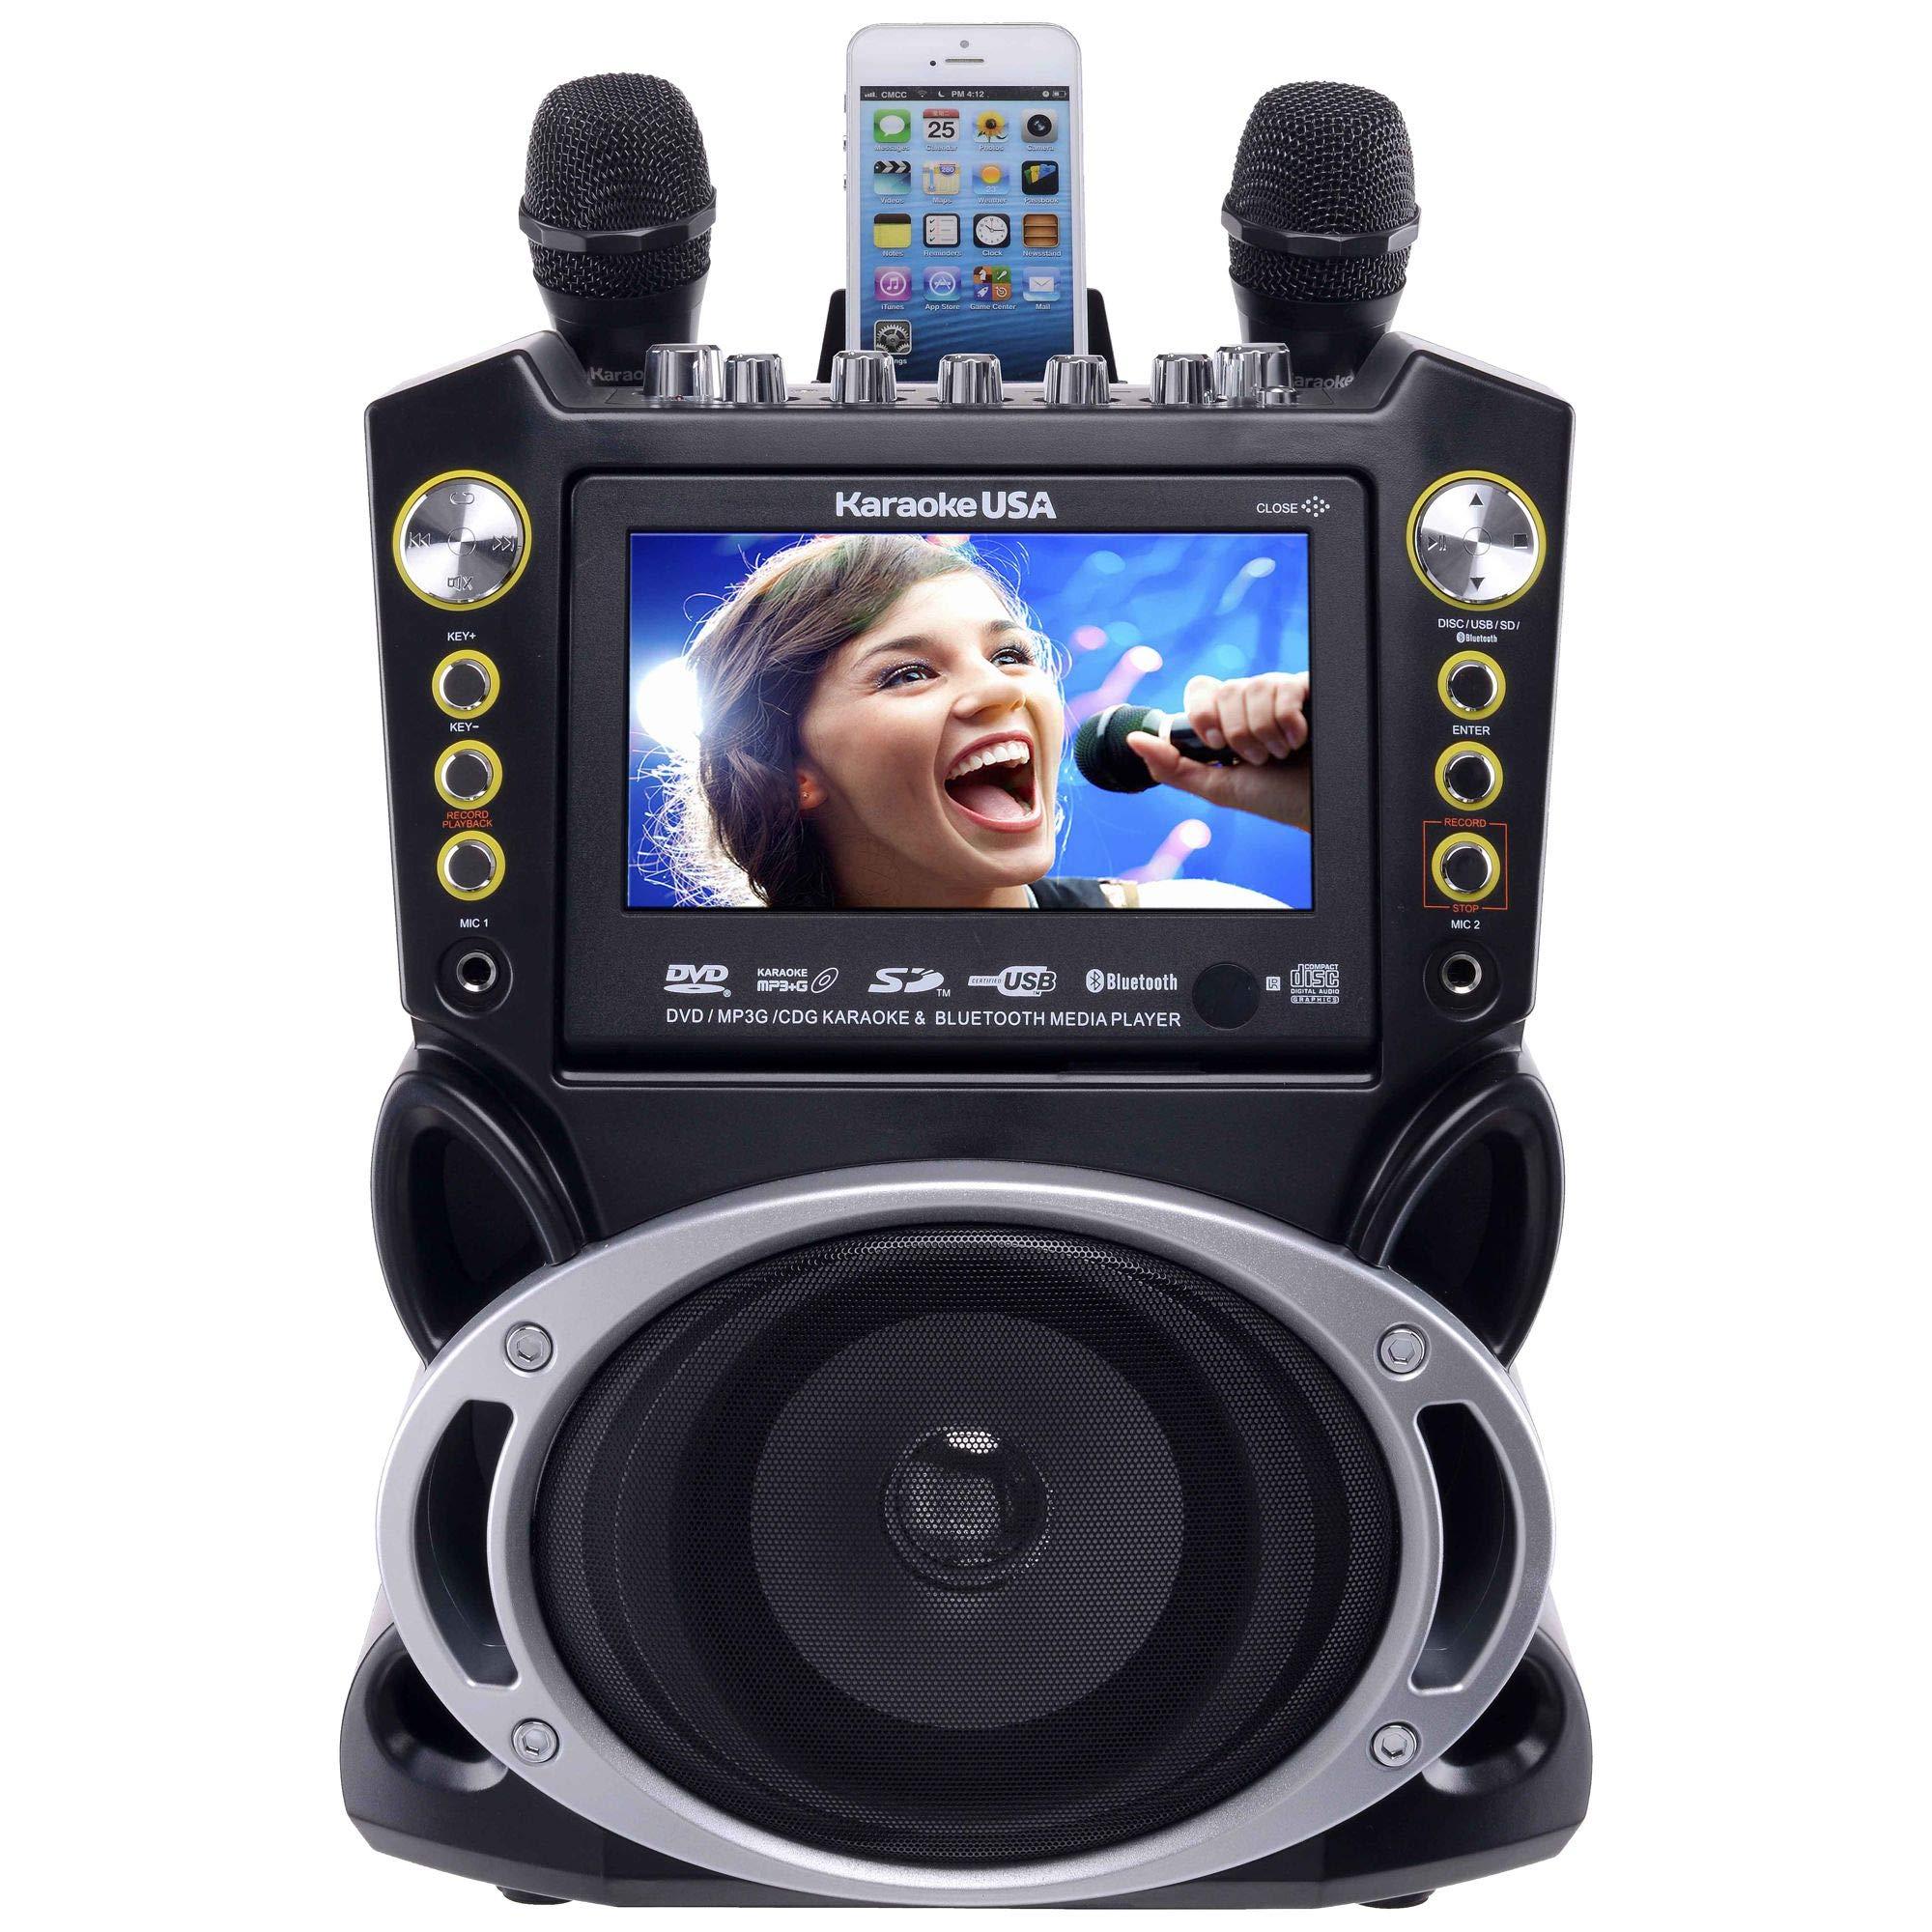 Karaoke USA Player GF844